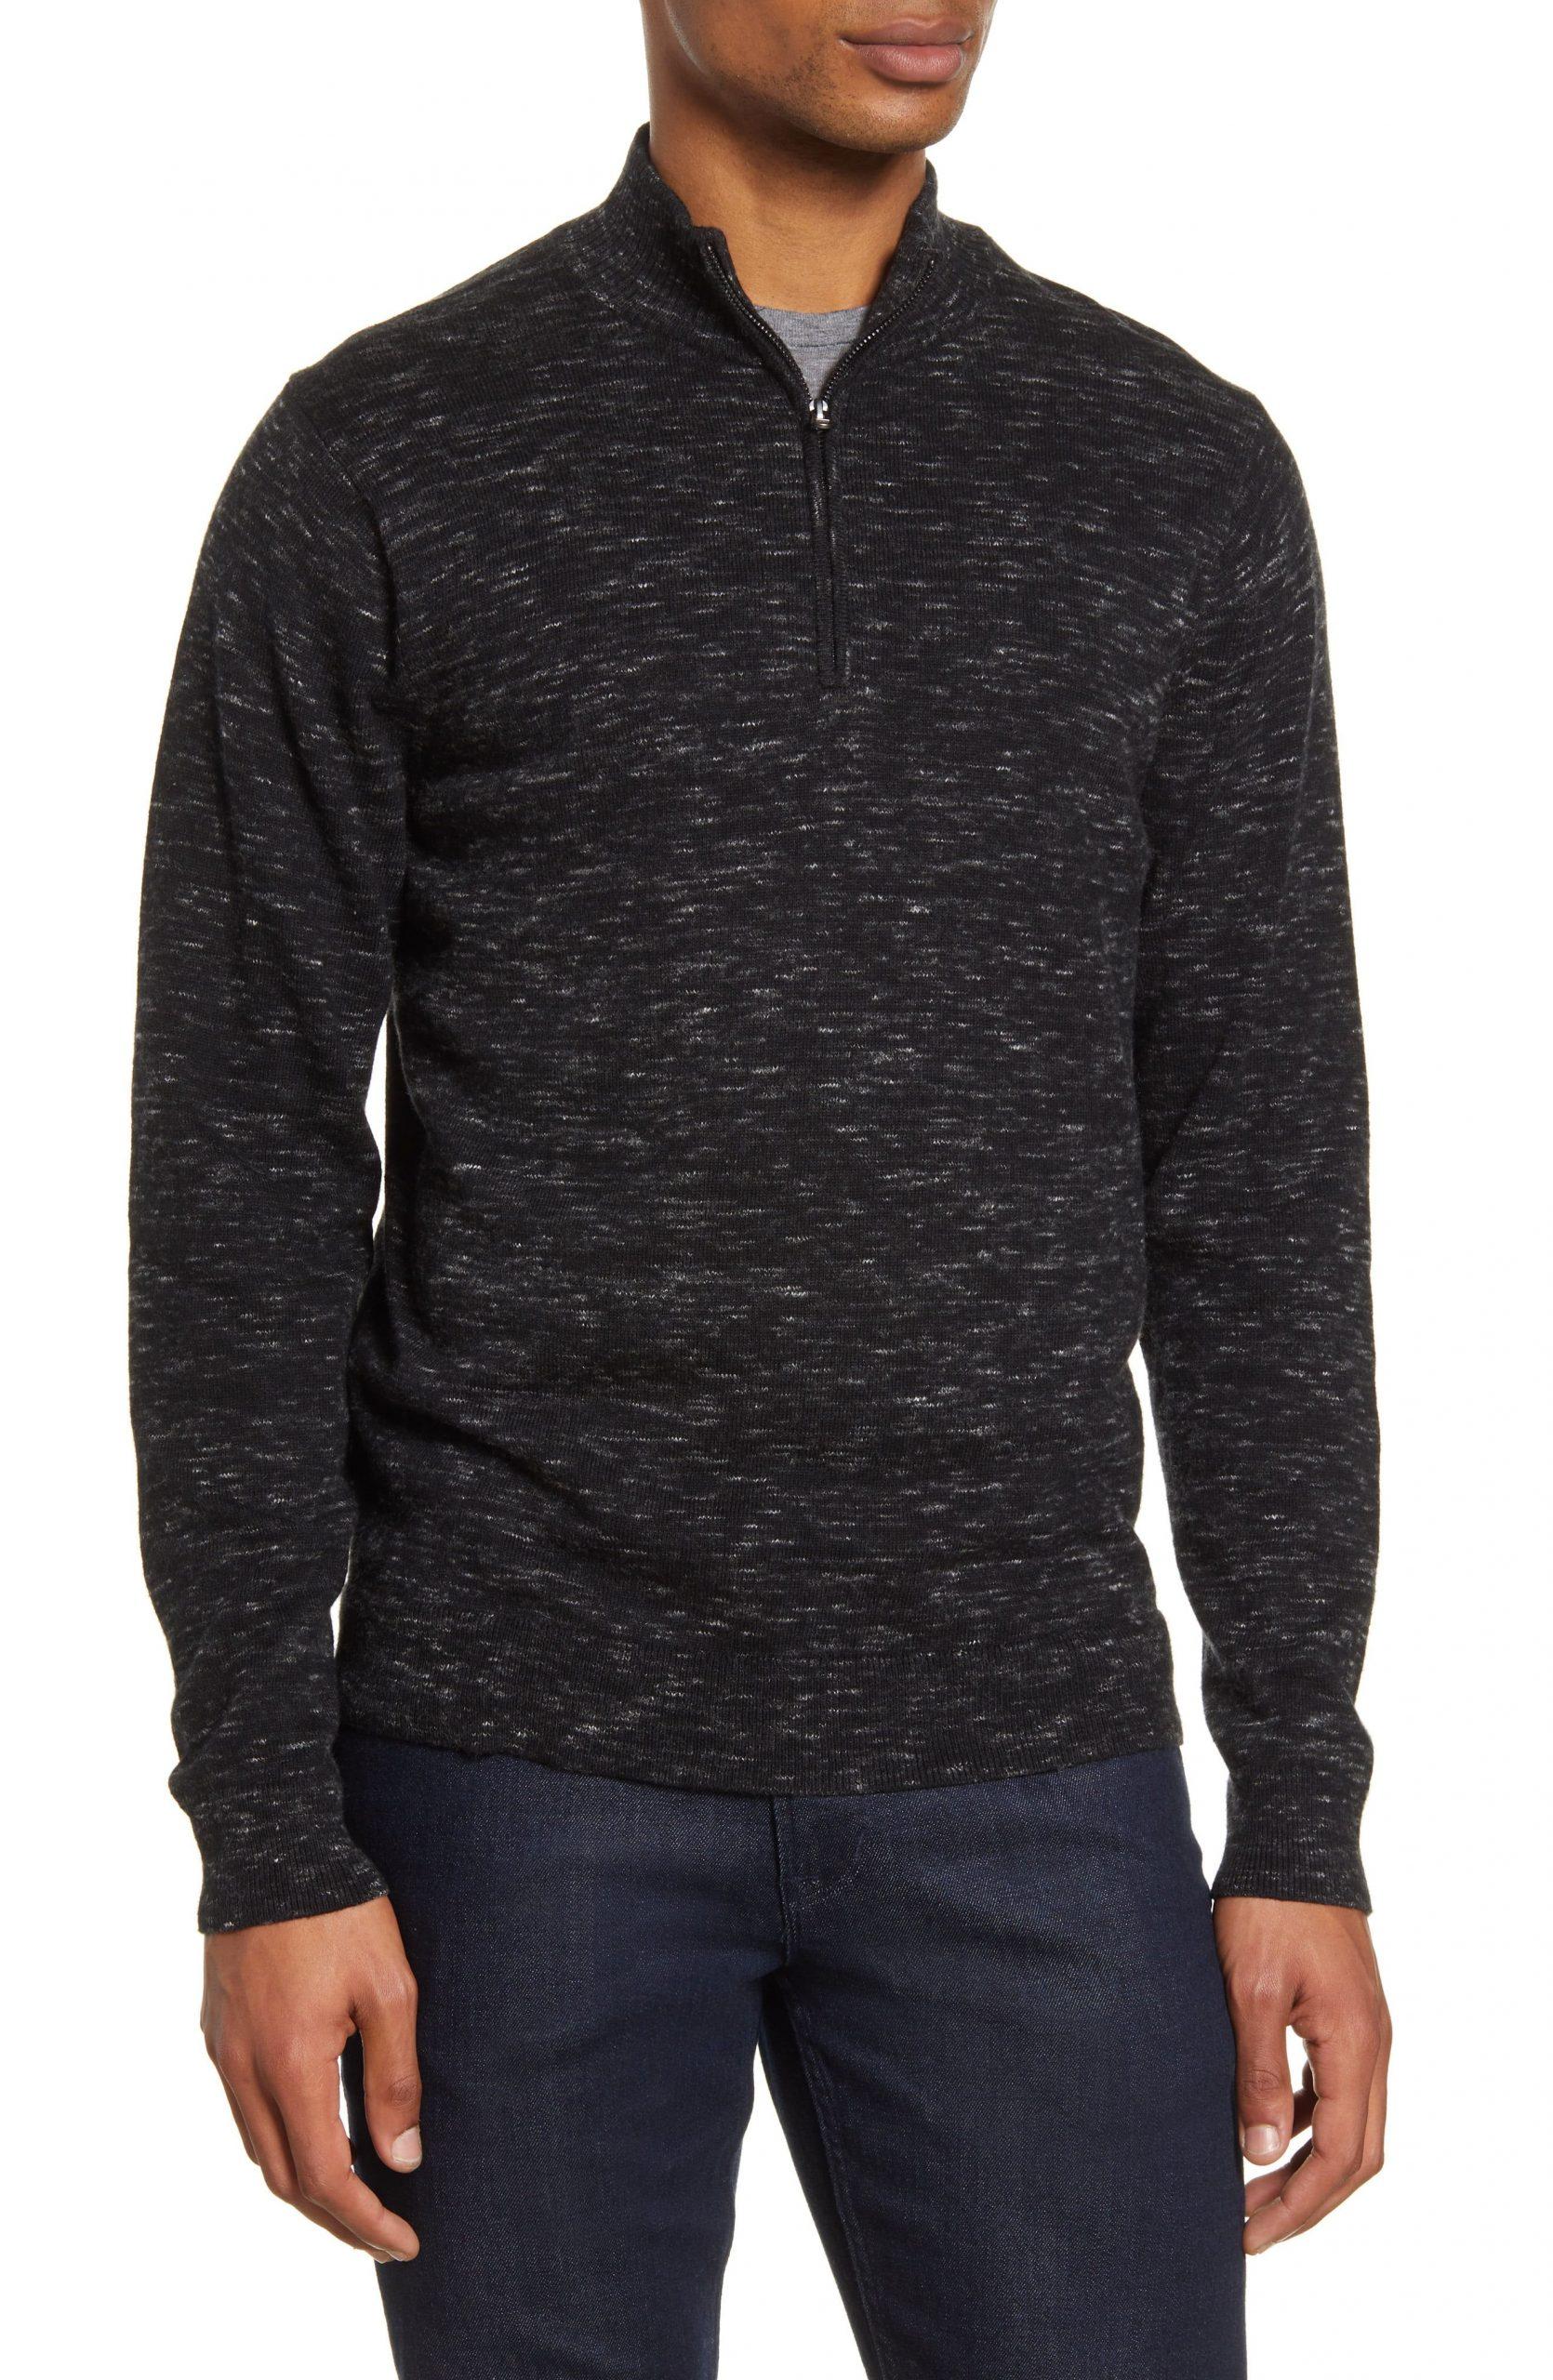 Men's Nordstrom Men's Shop Quarter Zip Cotton & Cashmere Pullover, Size Medium – Black